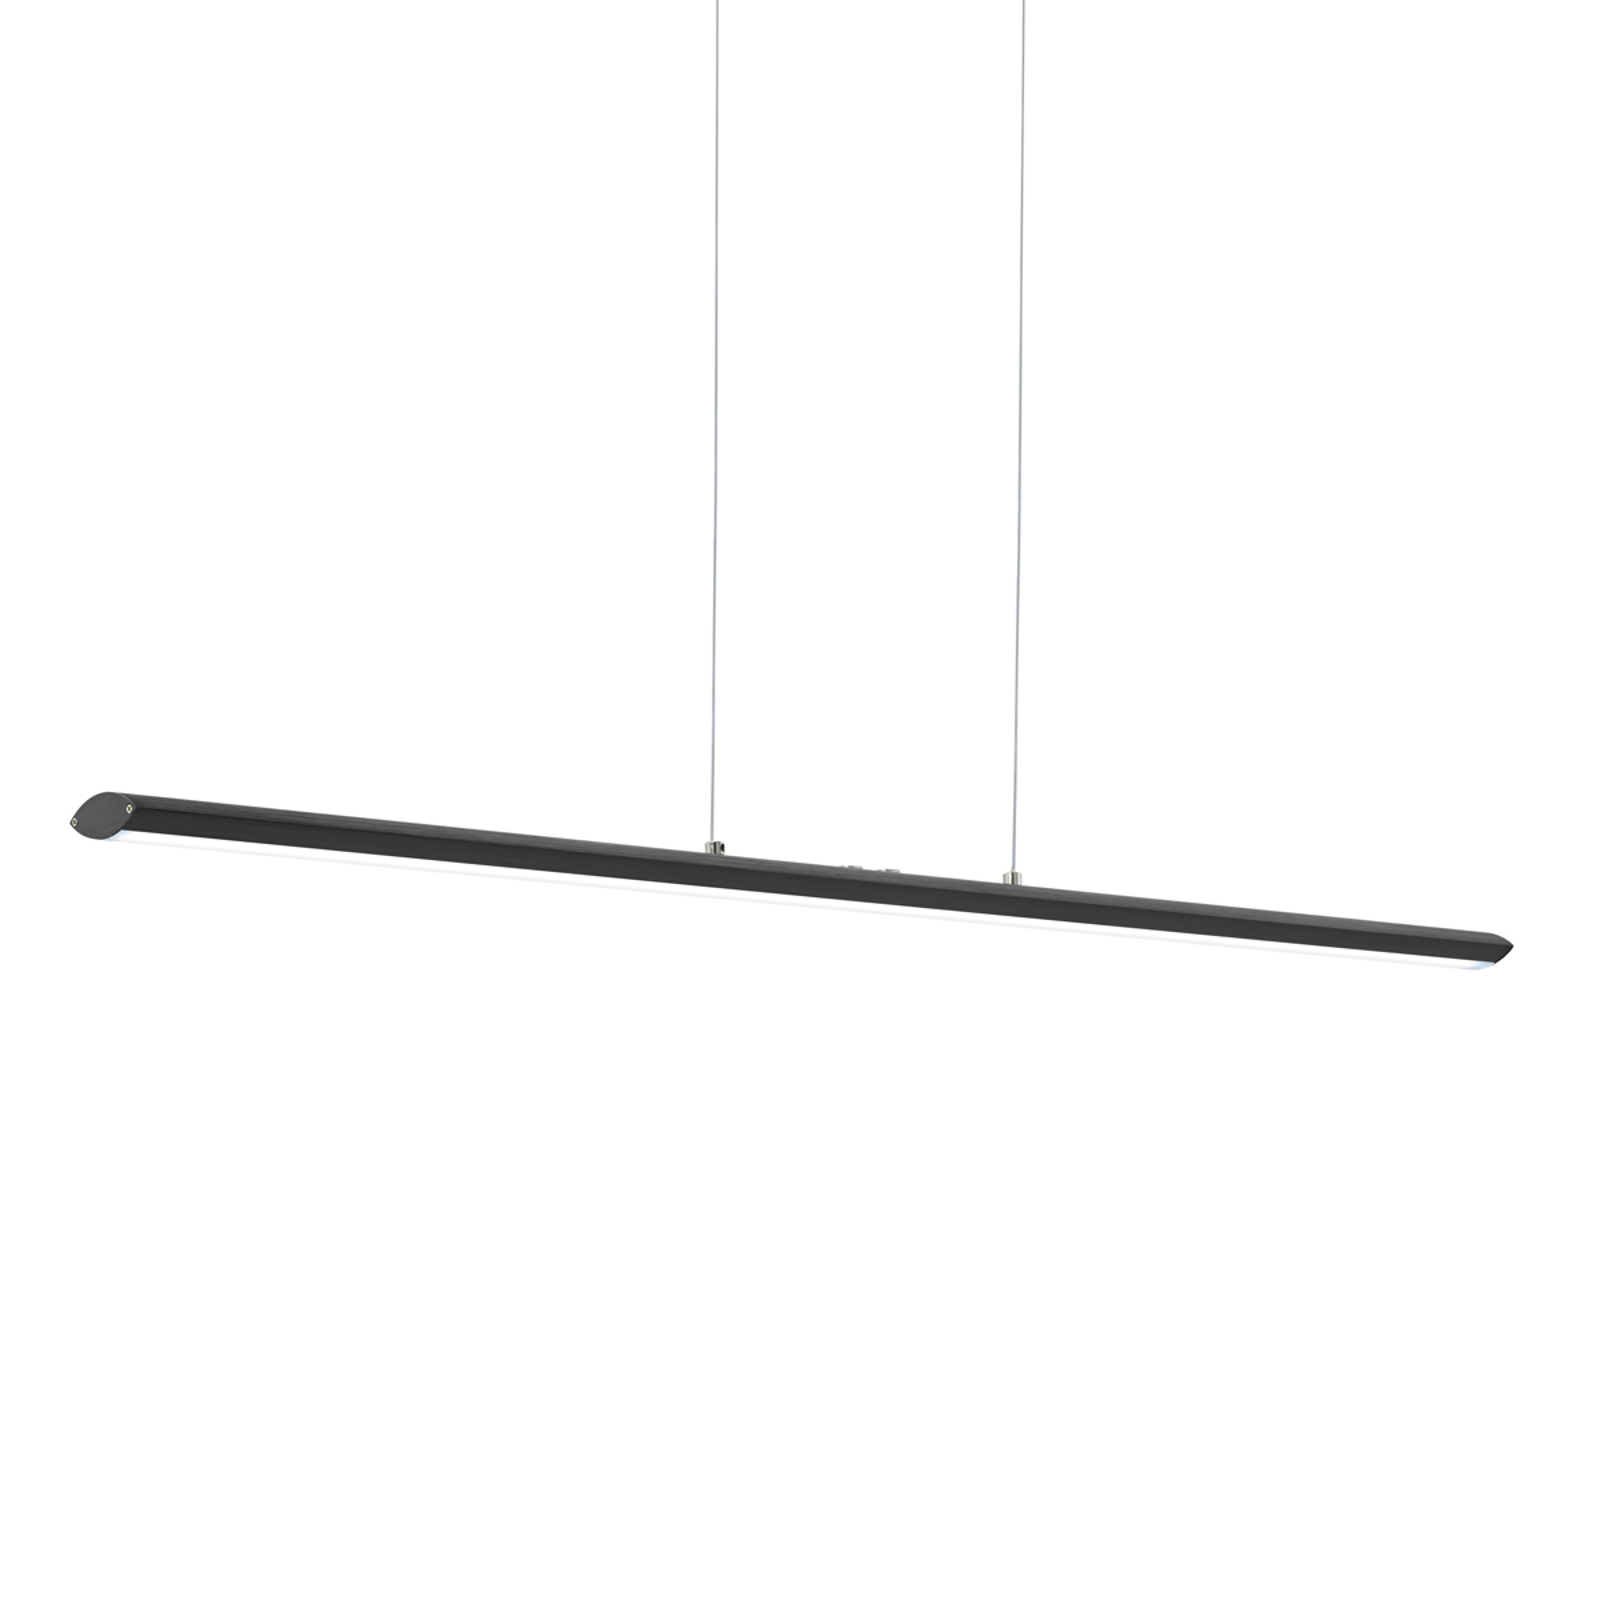 Suspension LED noire Pellaro, dimmable